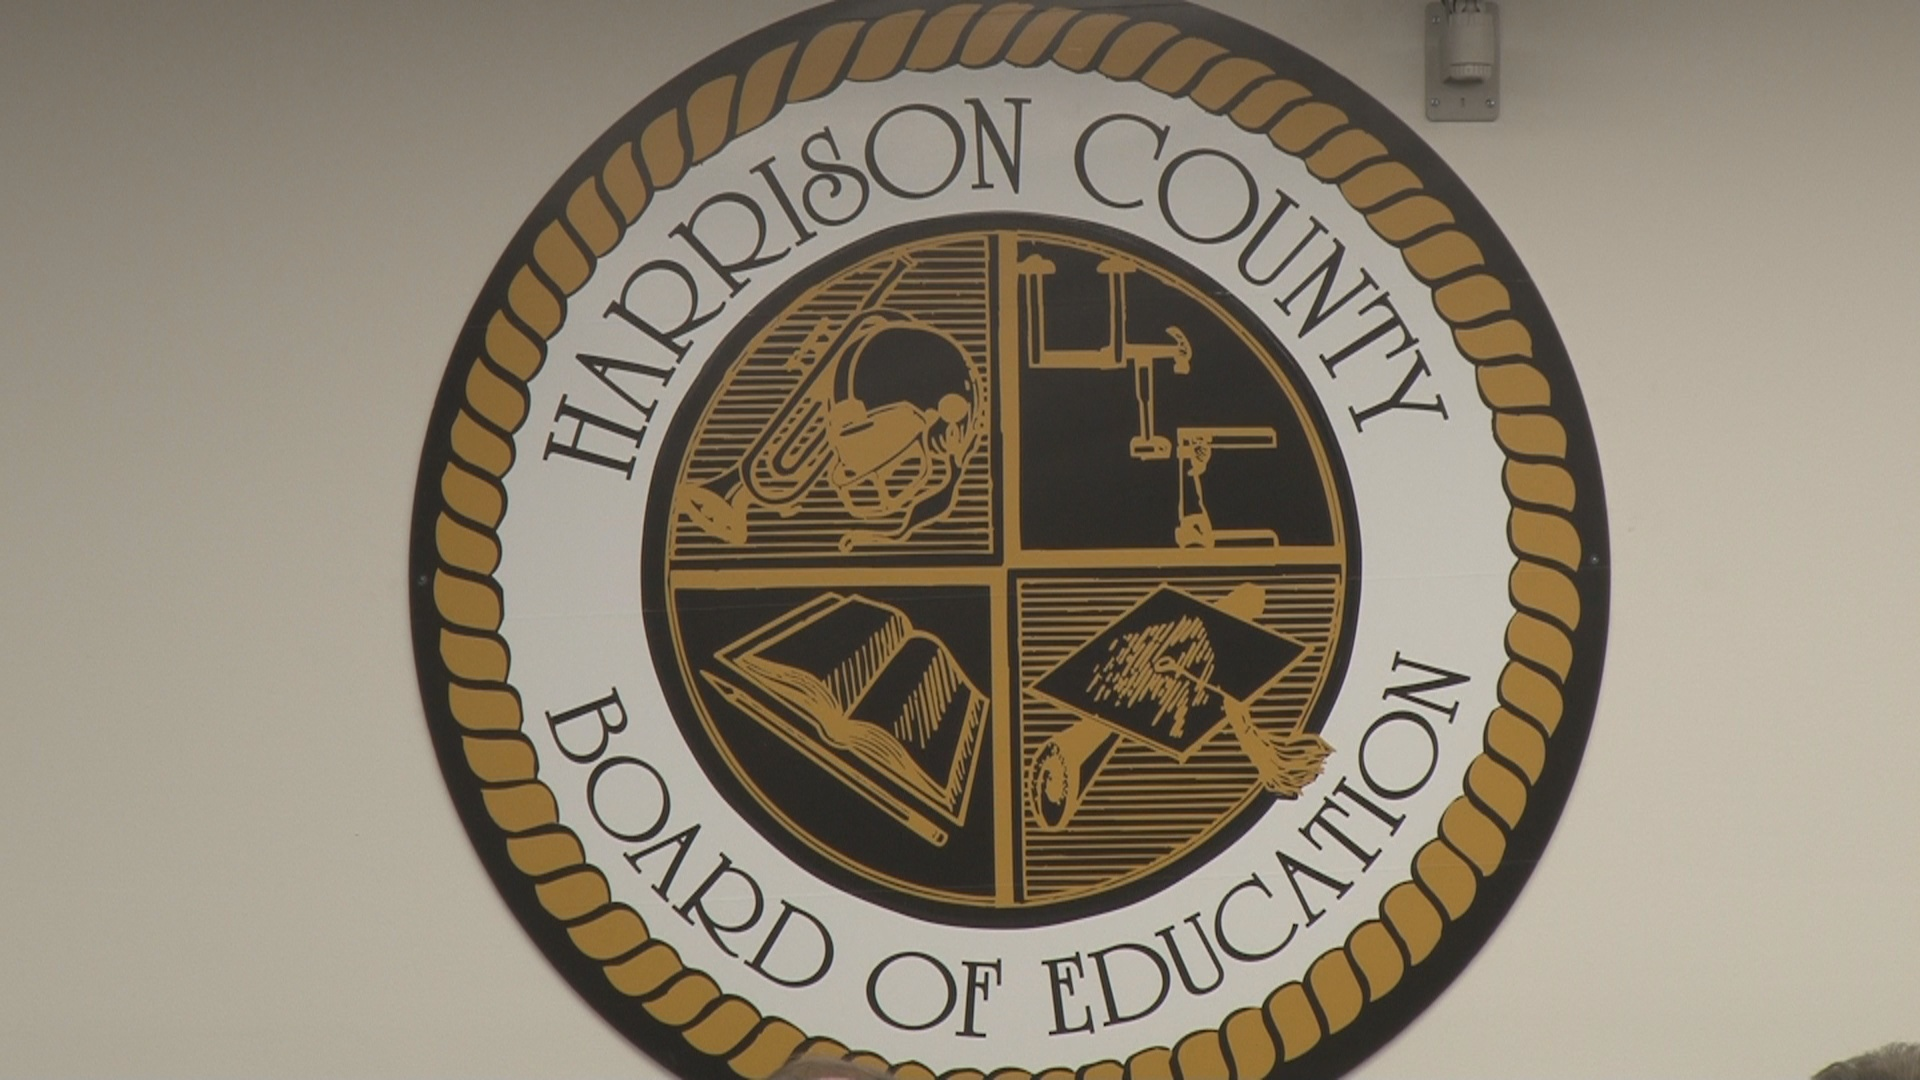 Harrison County BOE 10.3.17_1517970178407.jpg.jpg